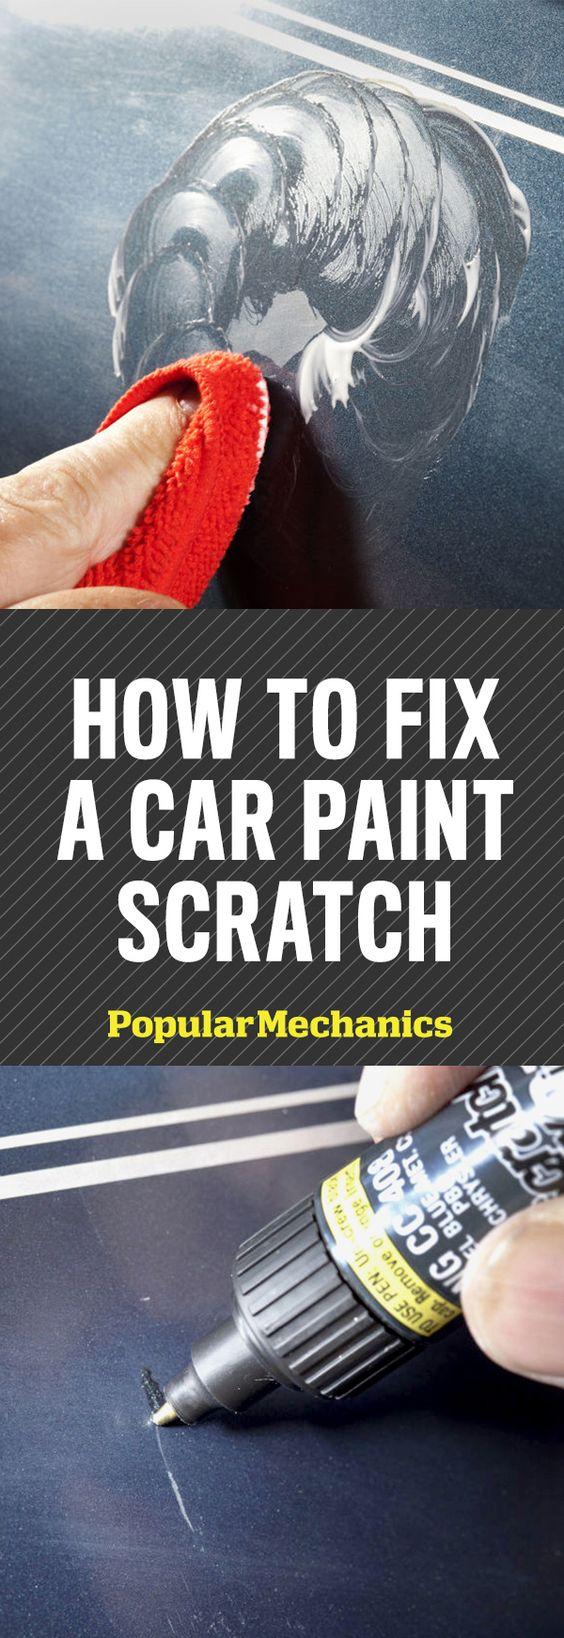 How To Fix a Car Paint Scratch